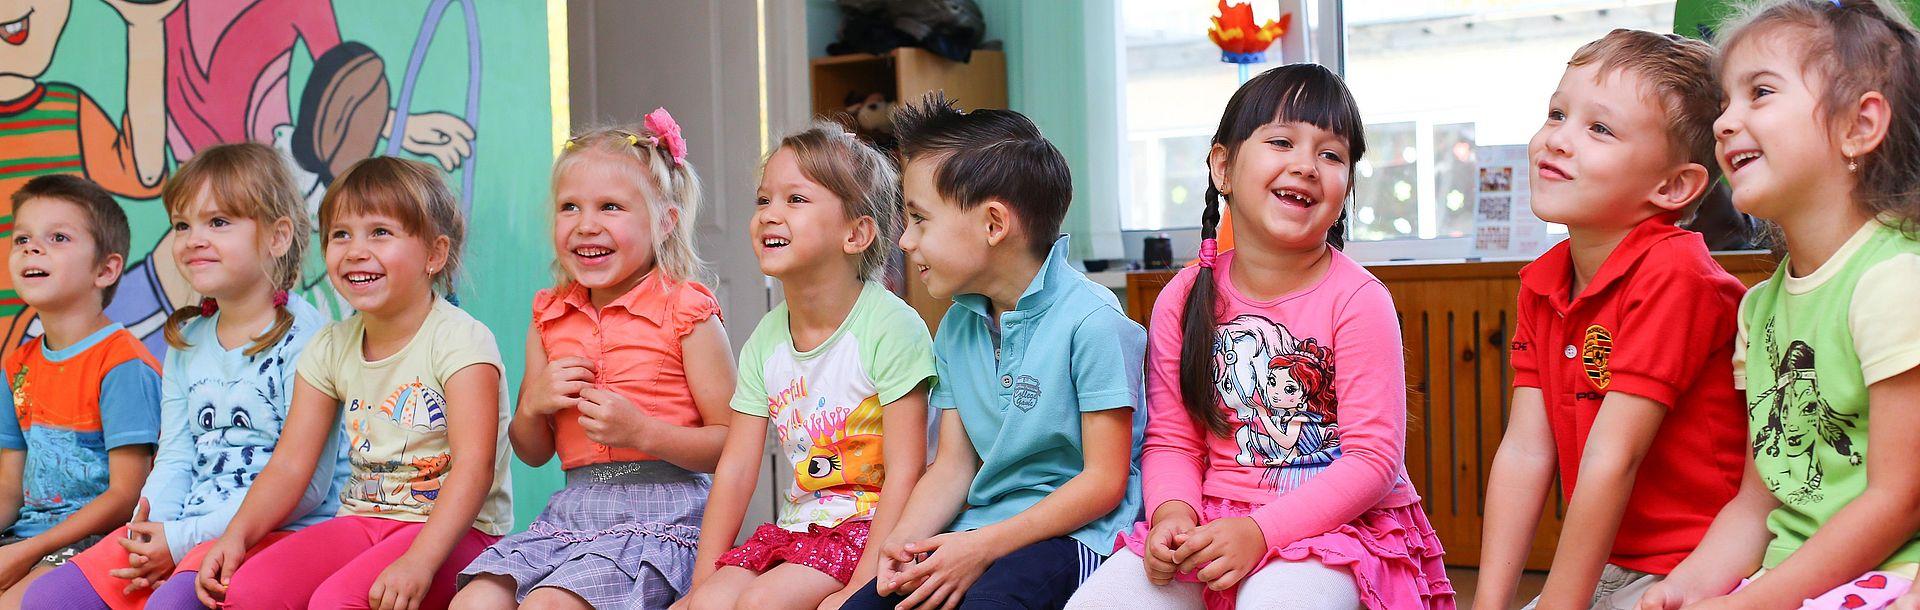 Vormerkung Kinderbetreuung - sitzende Kinder